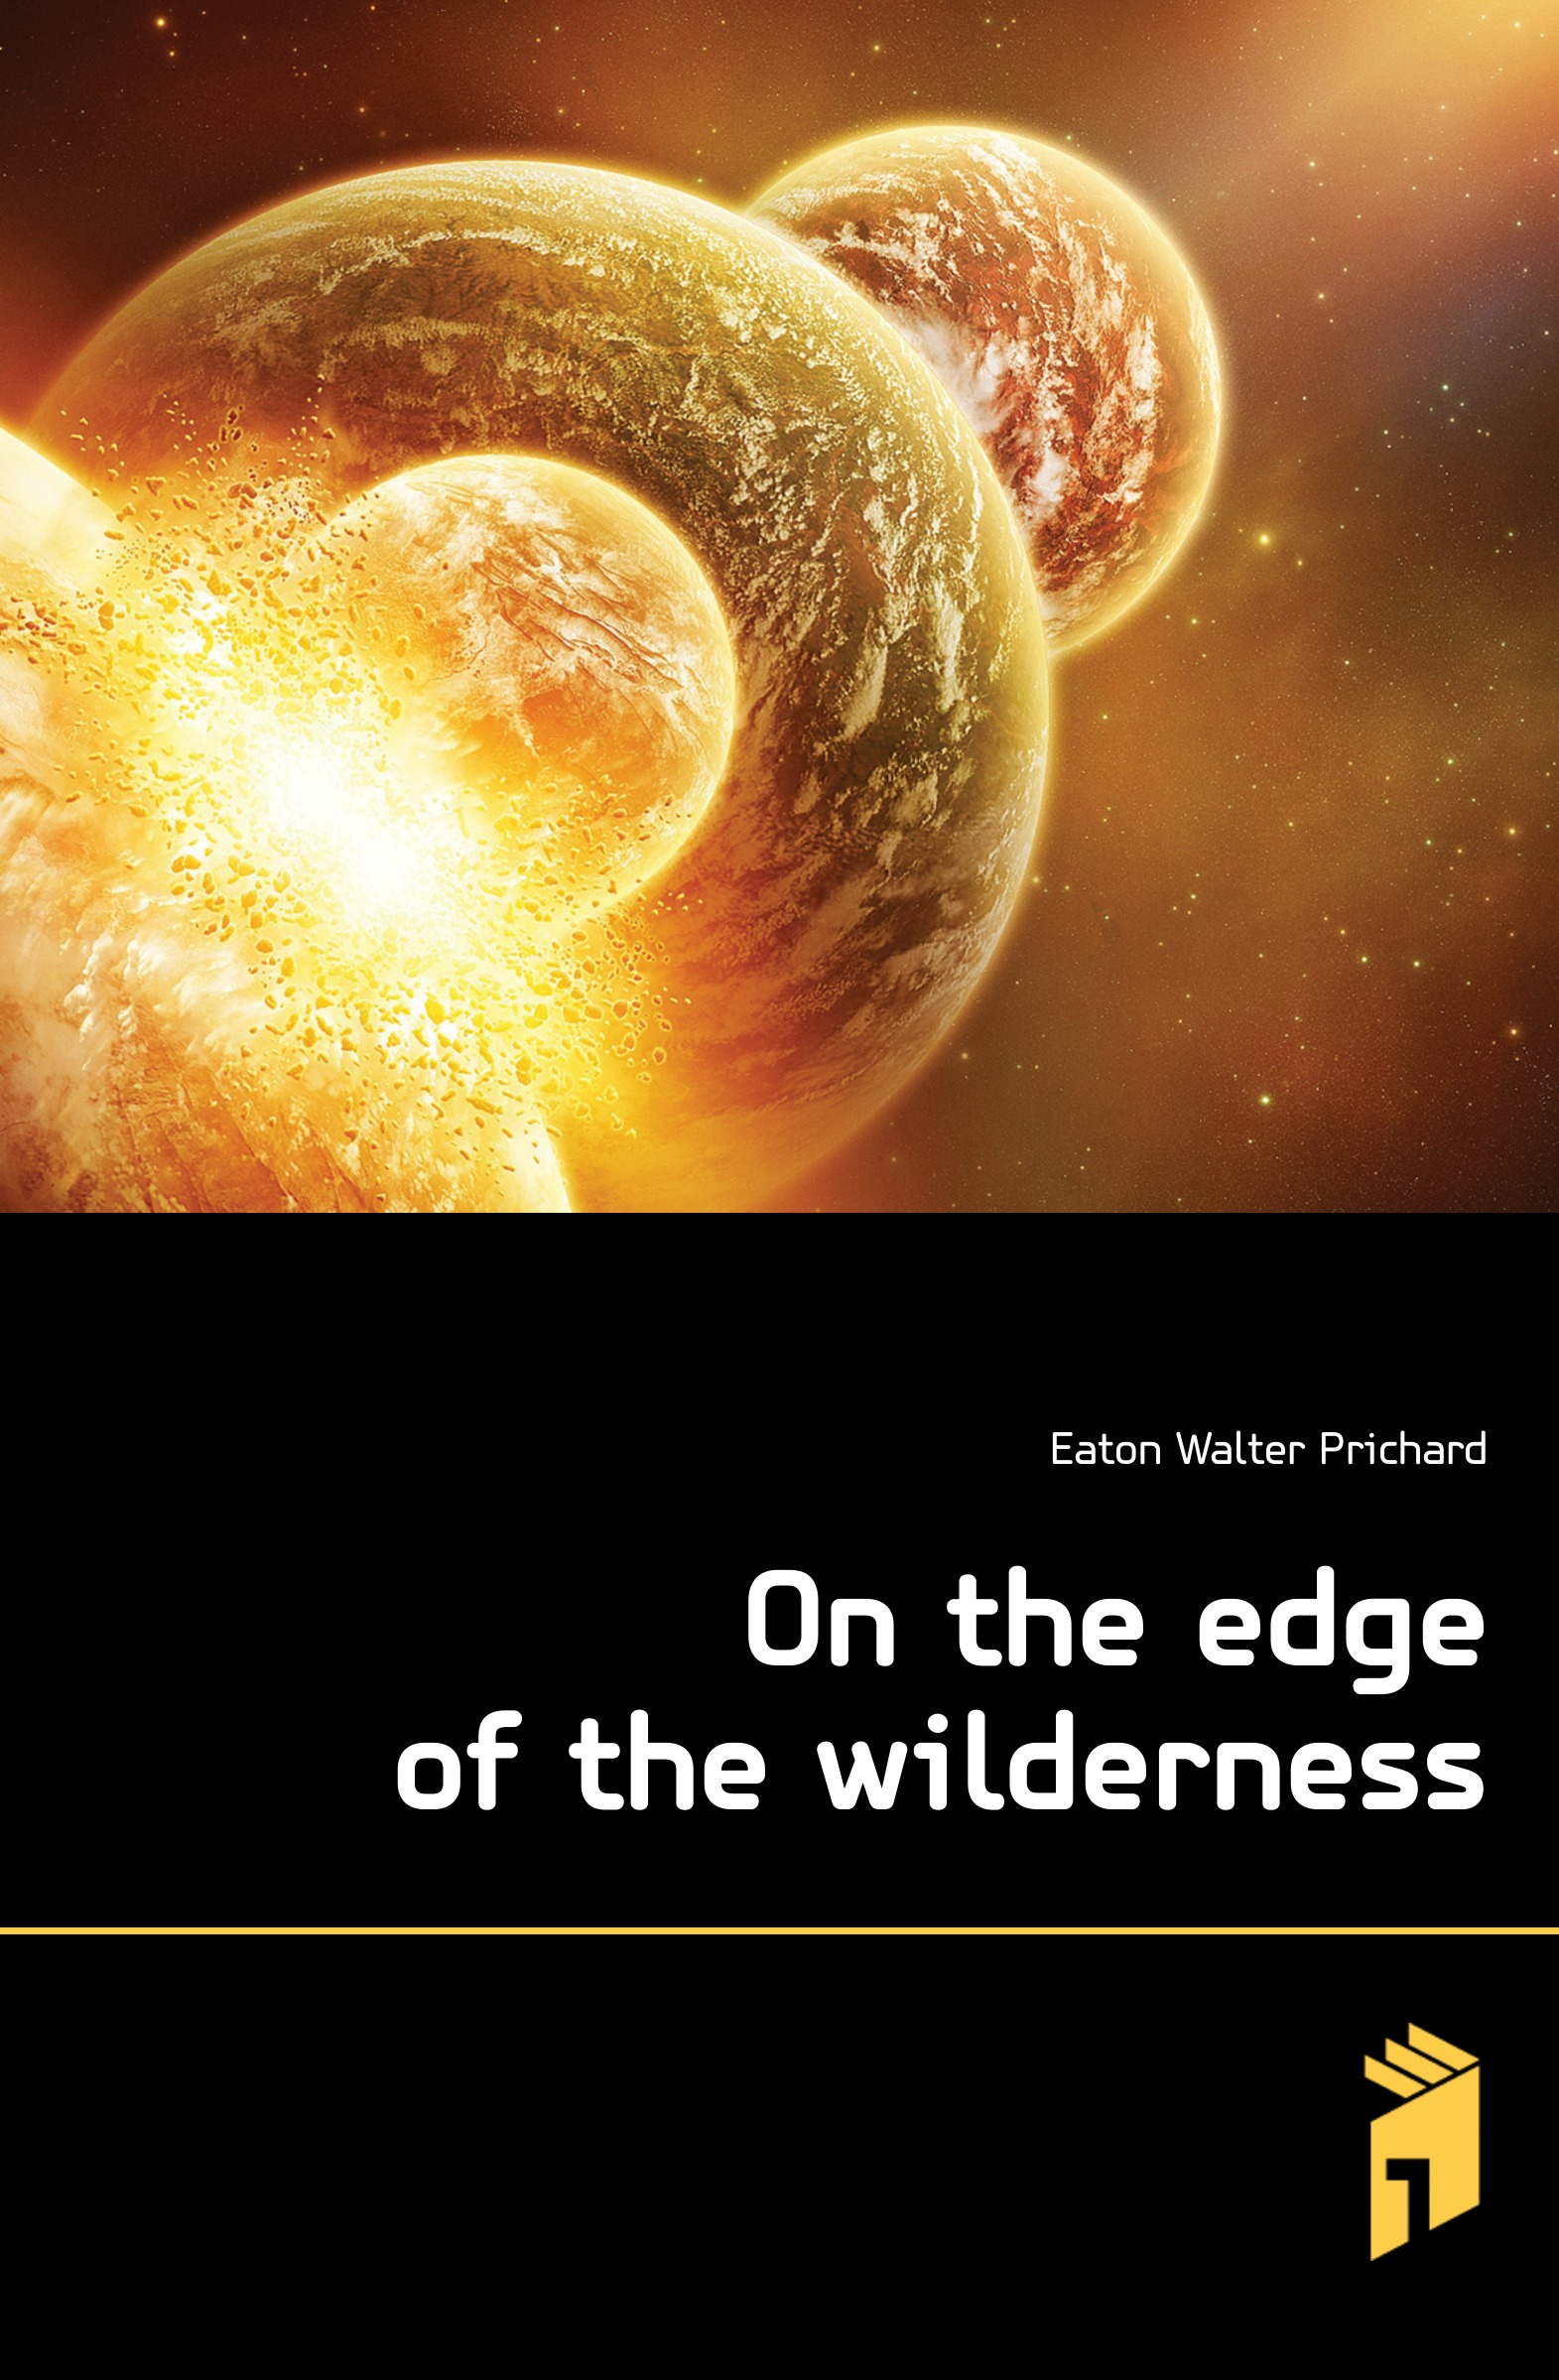 Eaton Walter Prichard On the edge of the wilderness